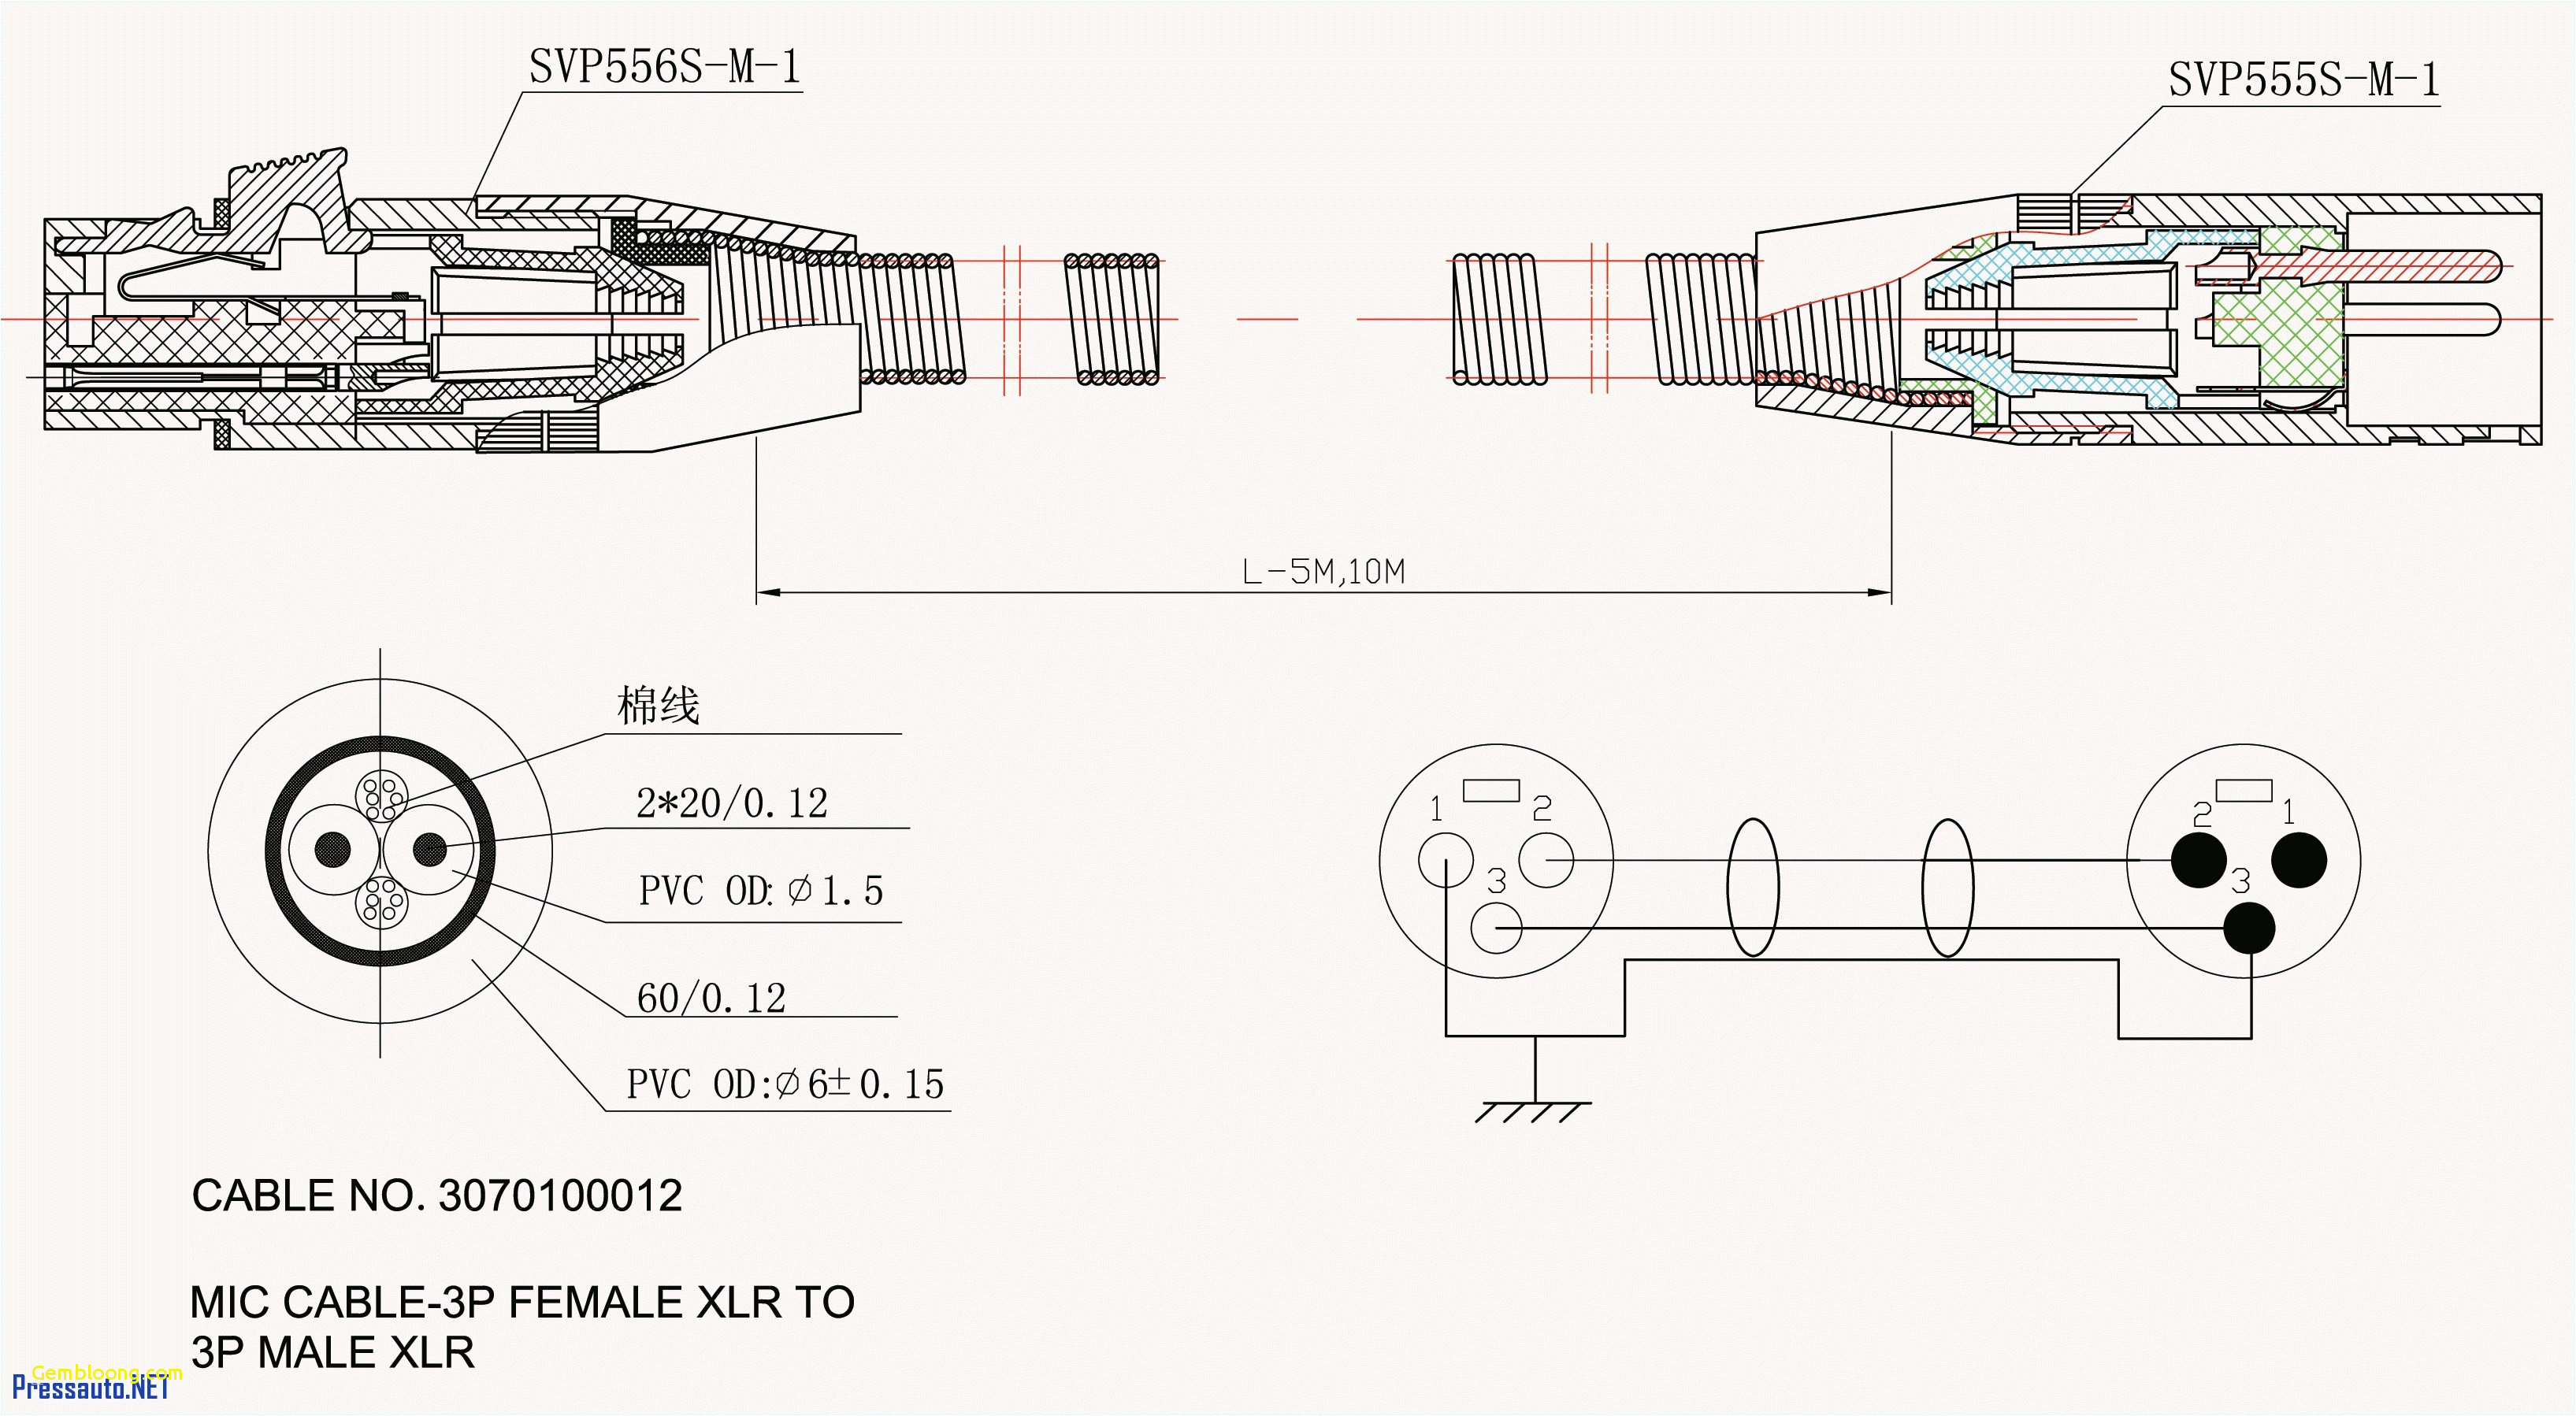 new mack wiring harness p n 41mr41165m ebay wiring diagrams bib new mack wiring harness p n 41mr41165m ebay